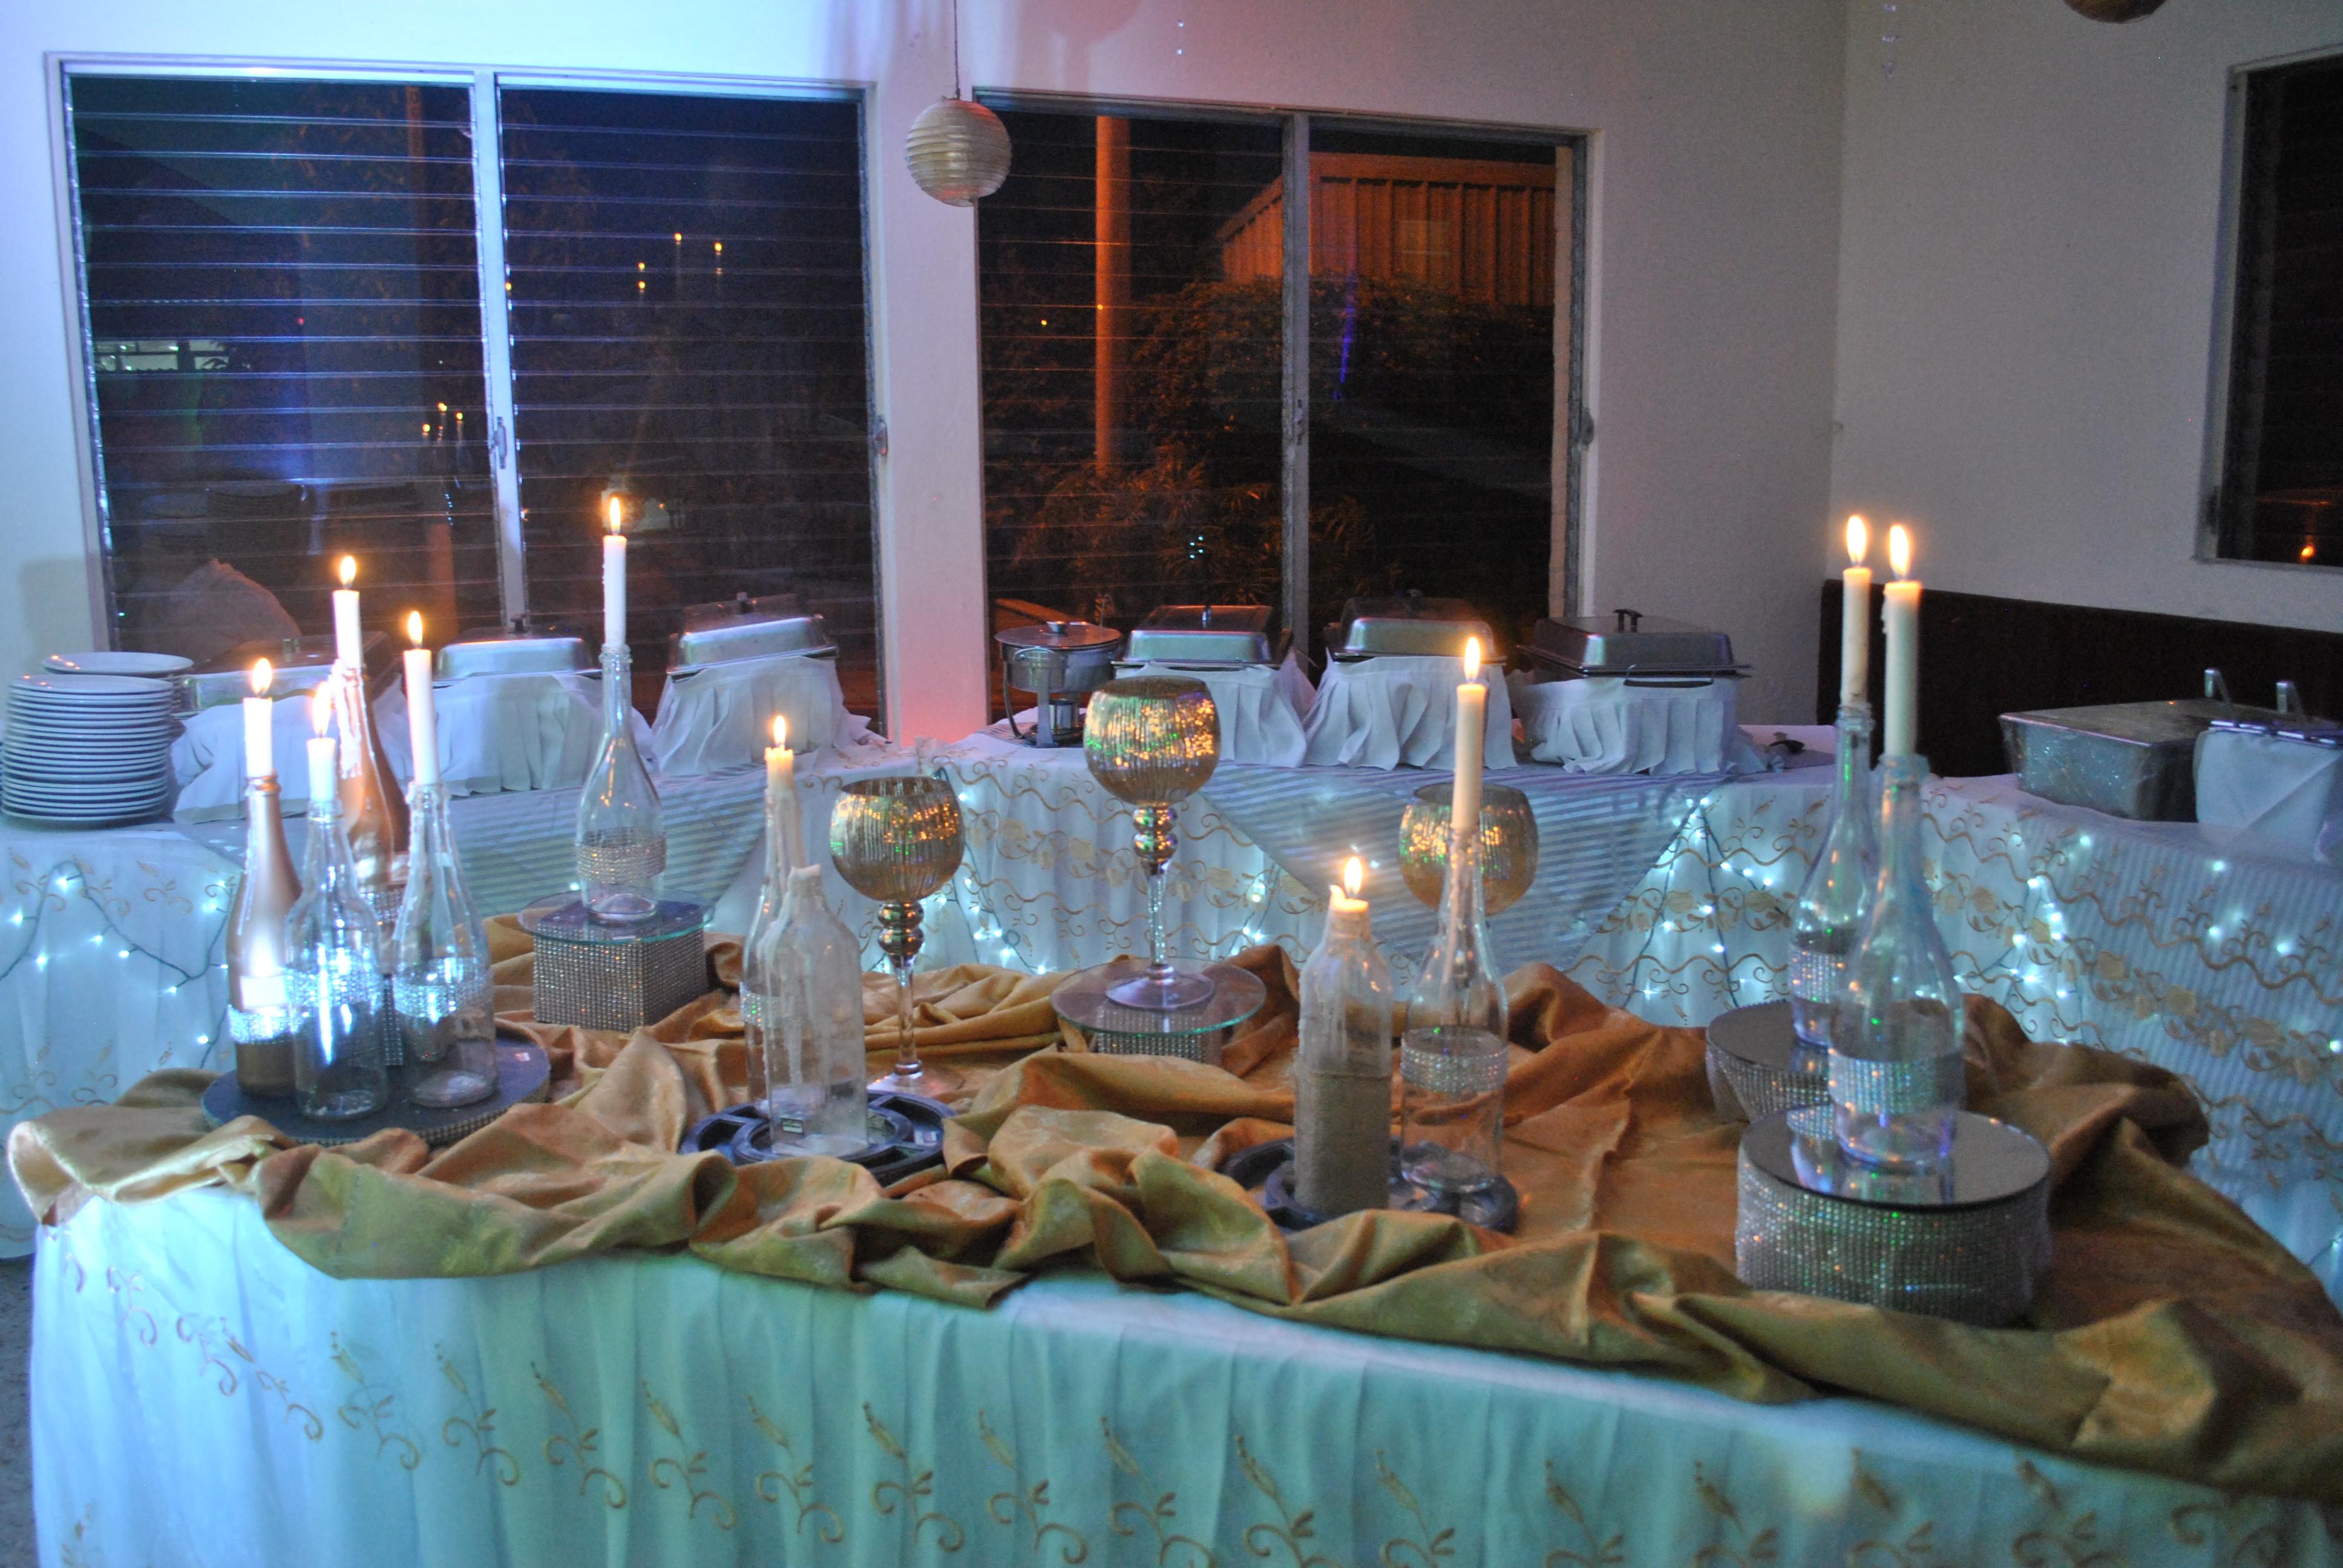 banquetes a domicilio, banquetes arr